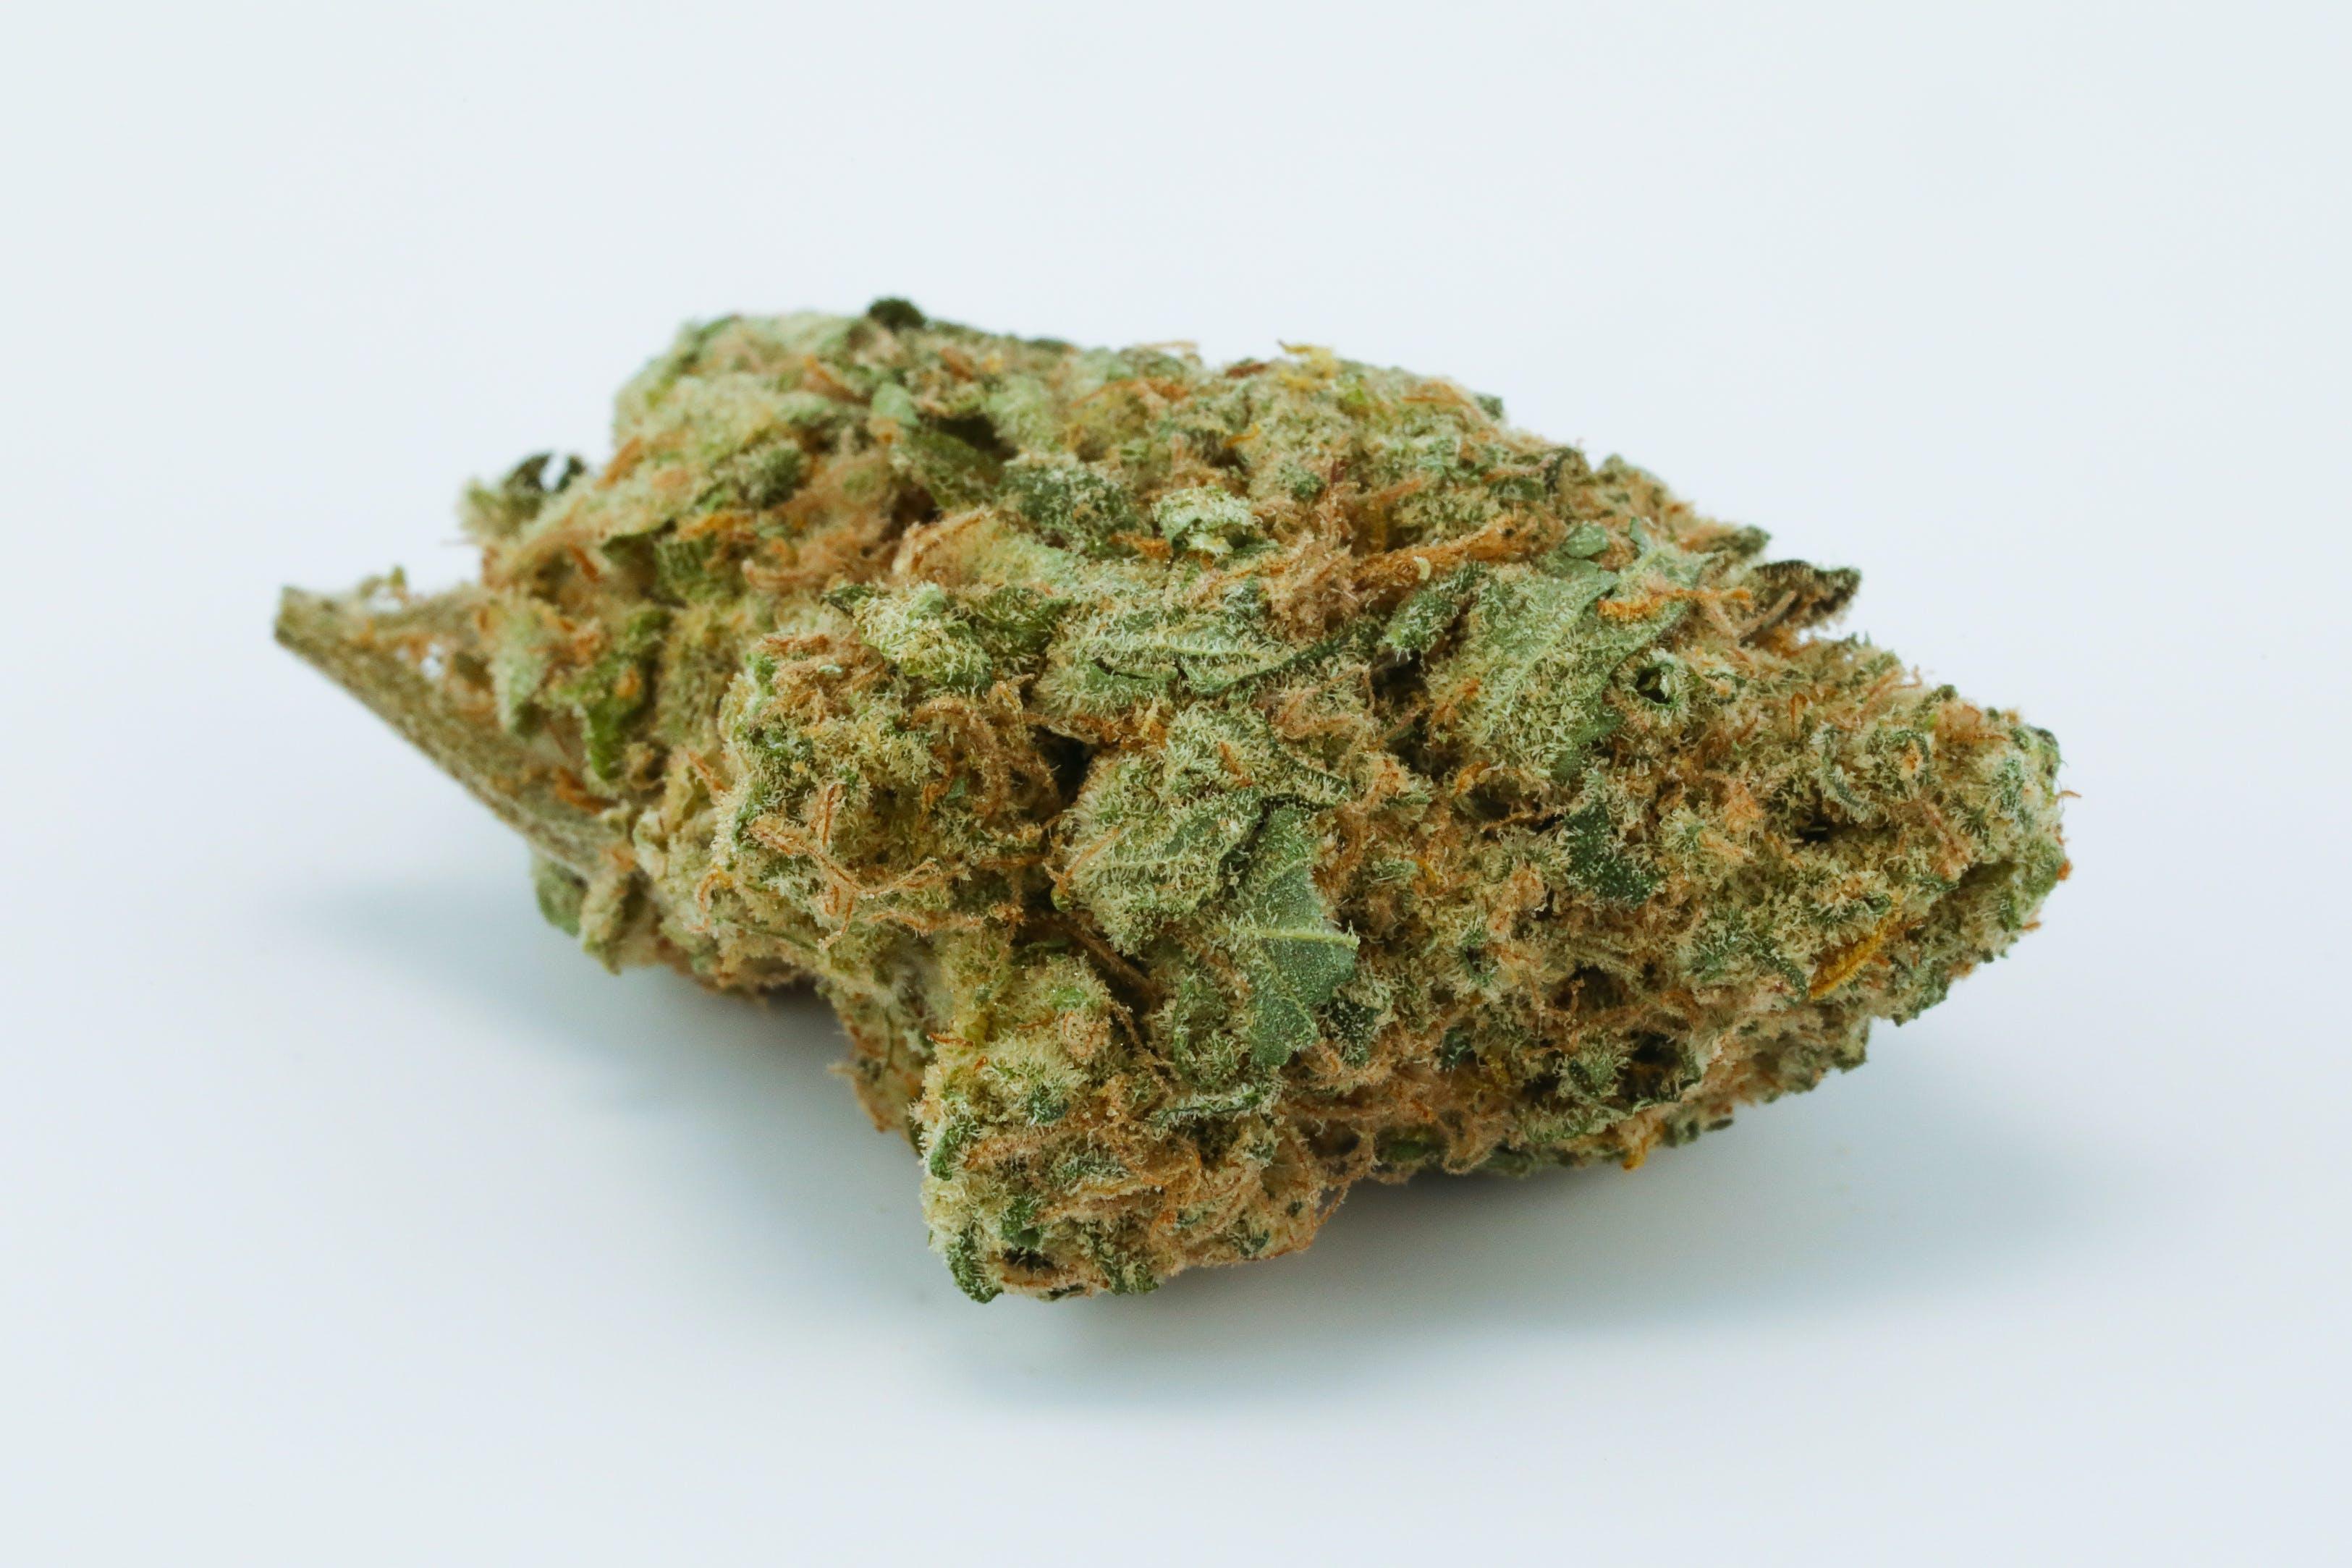 Panama Red Weed; Panama Red Cannabis Strain; Panama Red Sativa Marijuana Strain